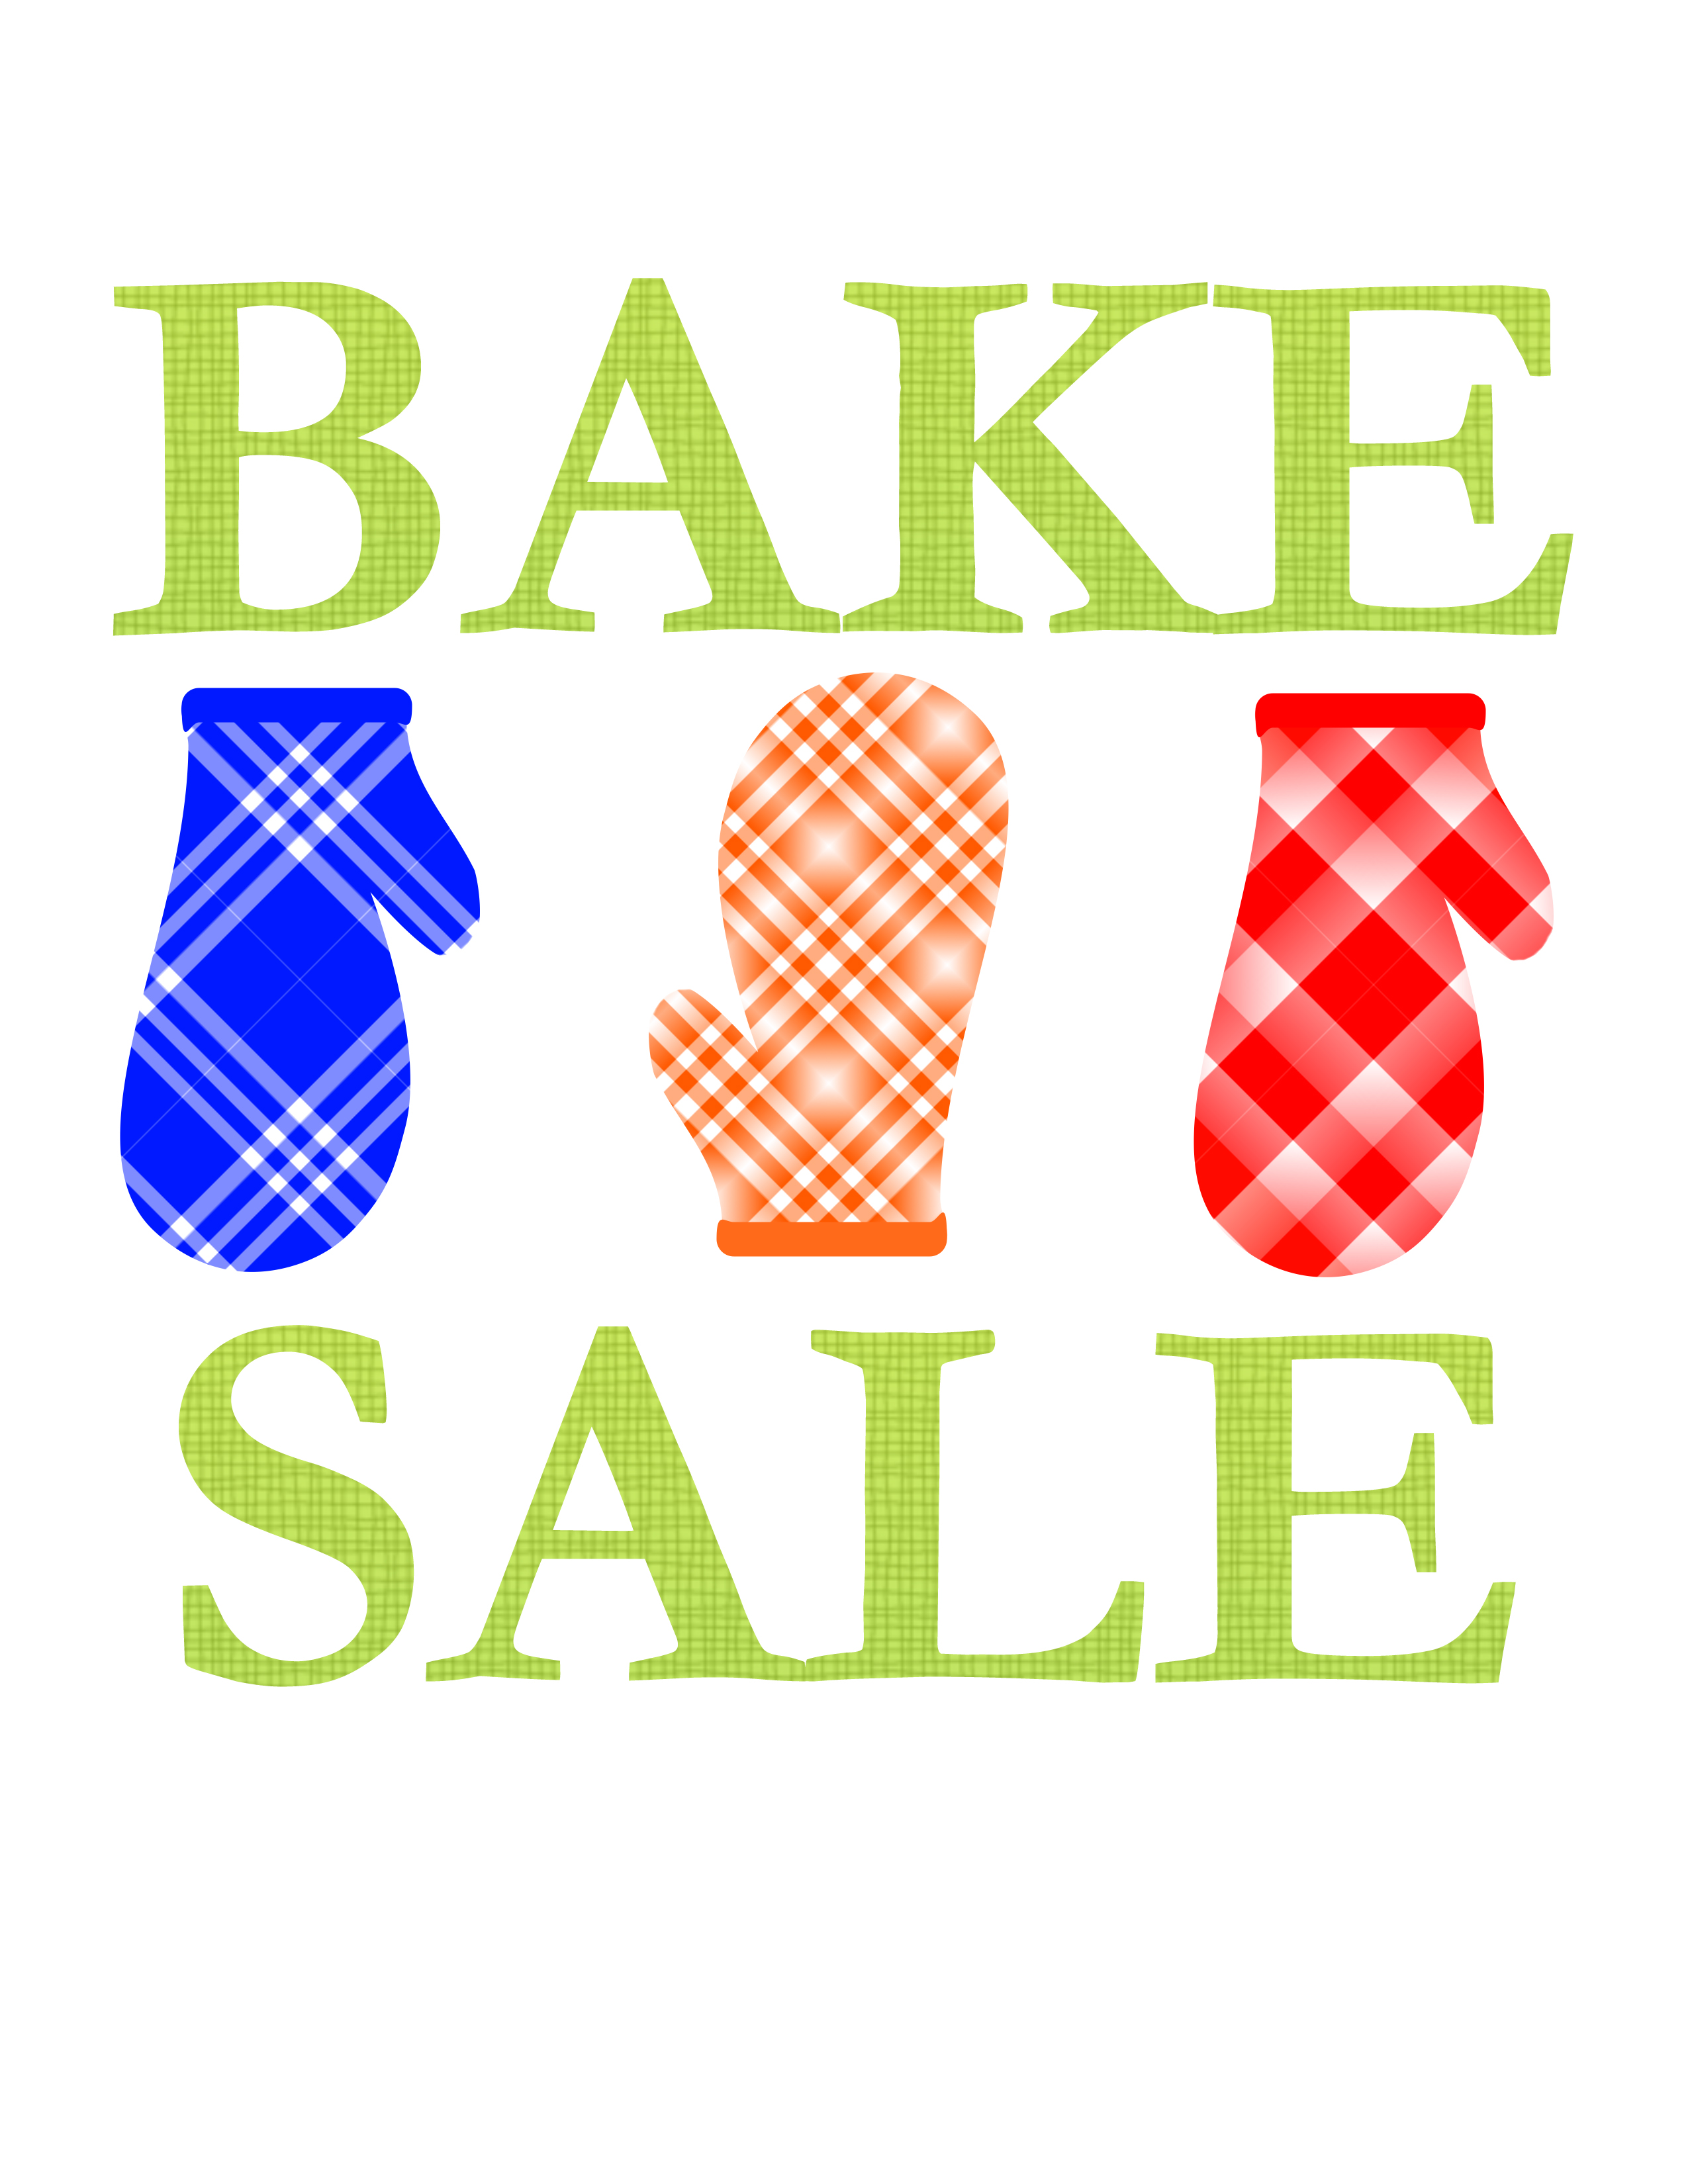 Free Bake Sale Clip Art 4-Free bake sale clip art 4-14